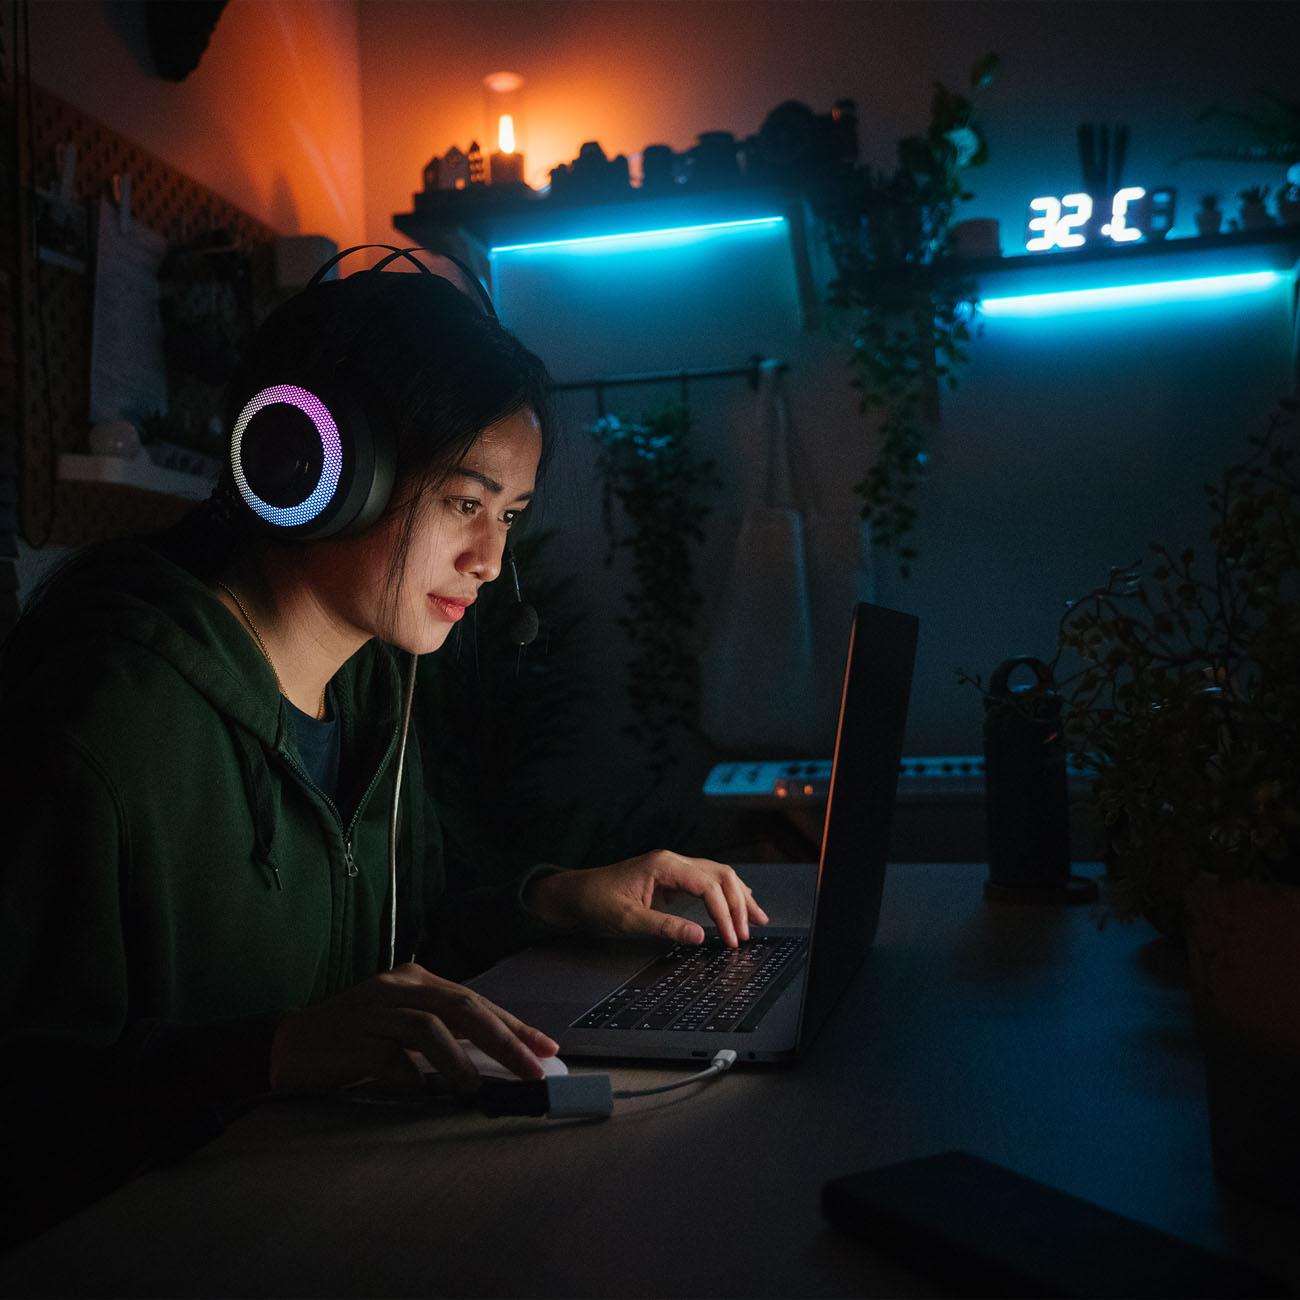 RGB LED Streifen mit Farbwechsel 3m - 2